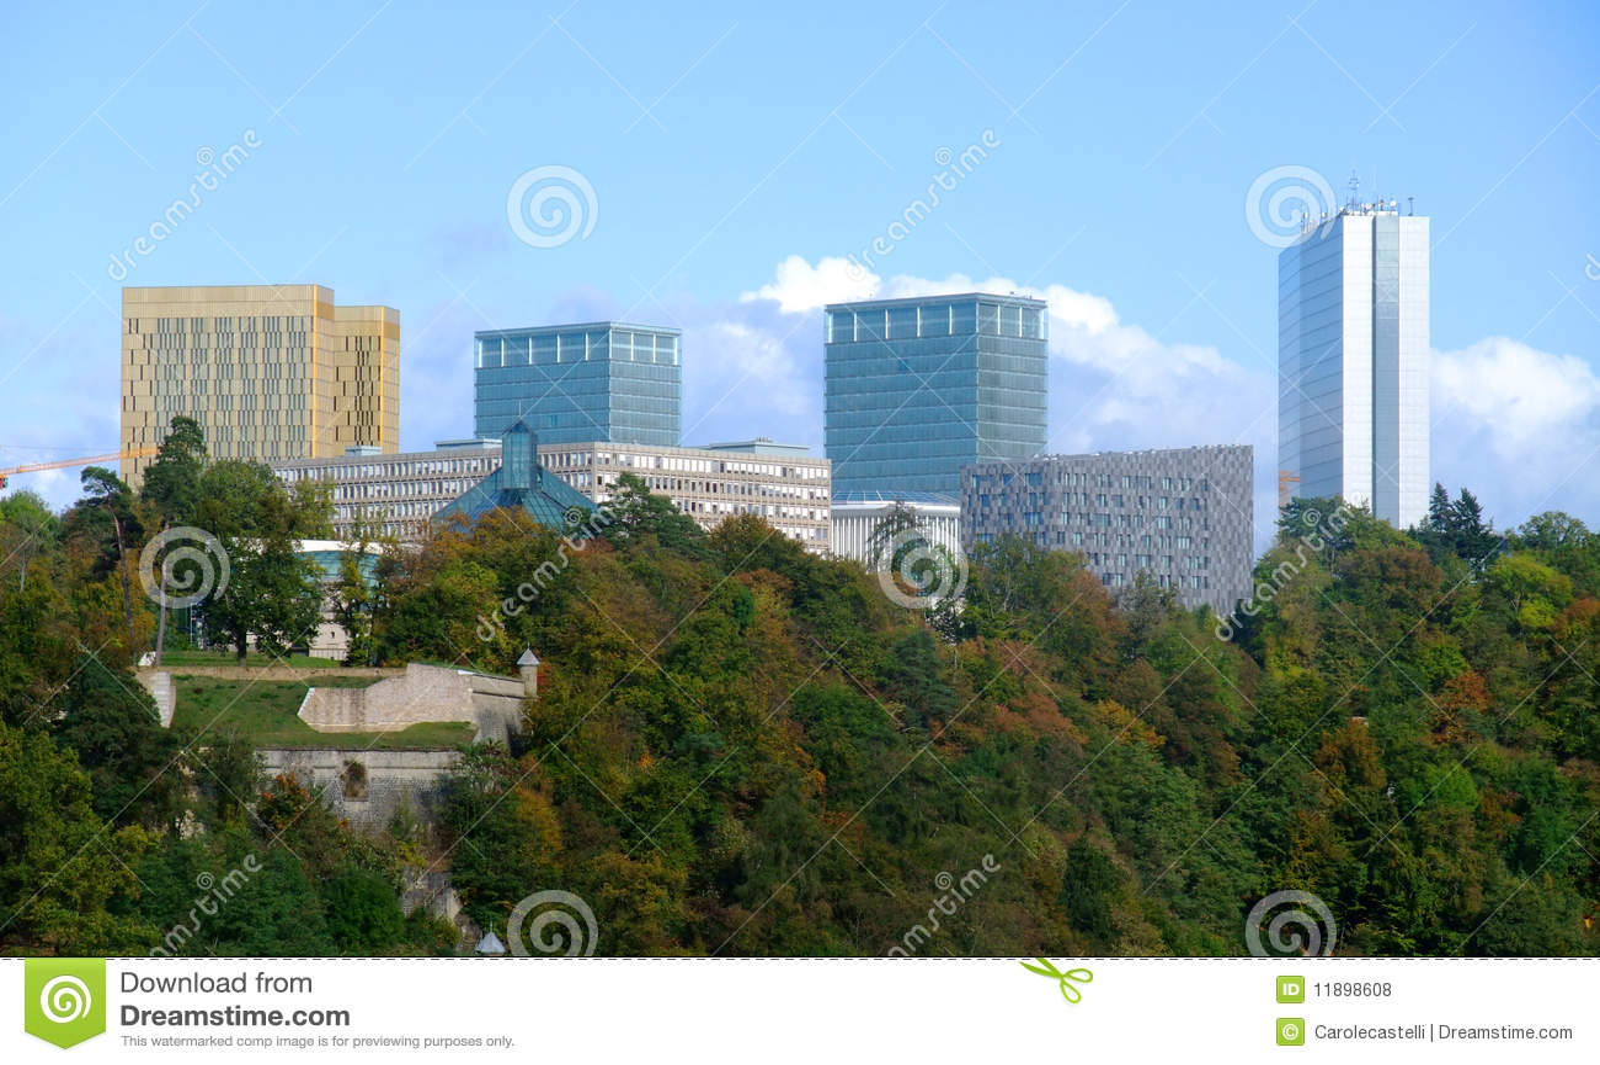 Edificios de instituciones europeos - Kirchberg